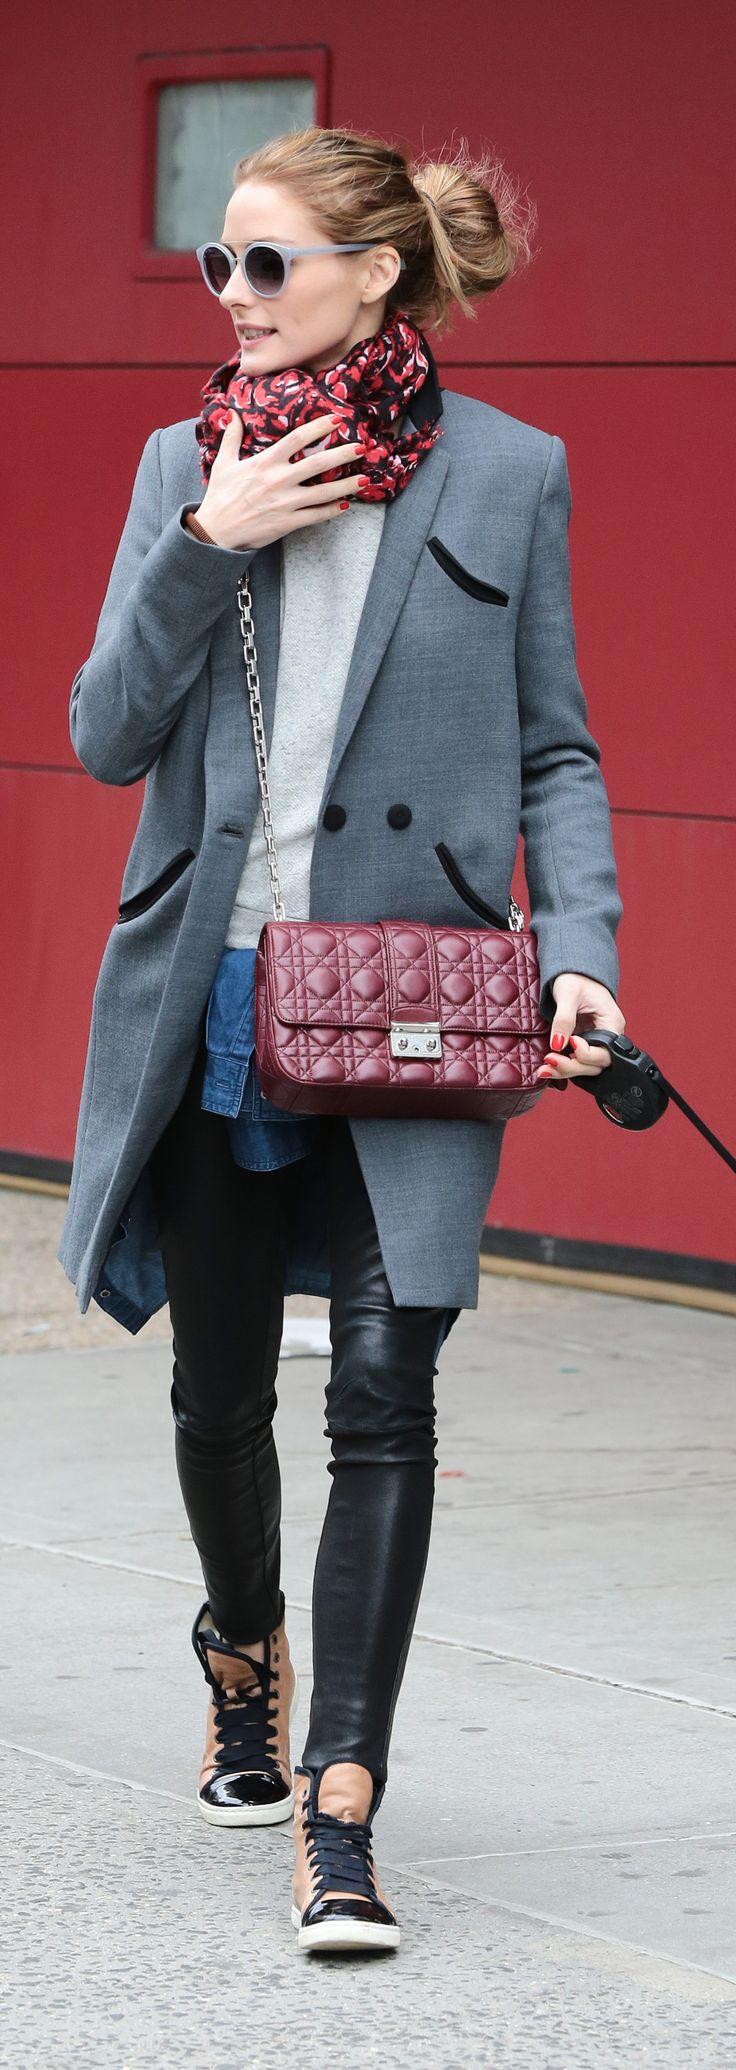 Let Olivia Palermo Walk You Through Her Insanely Chic Wardrobe